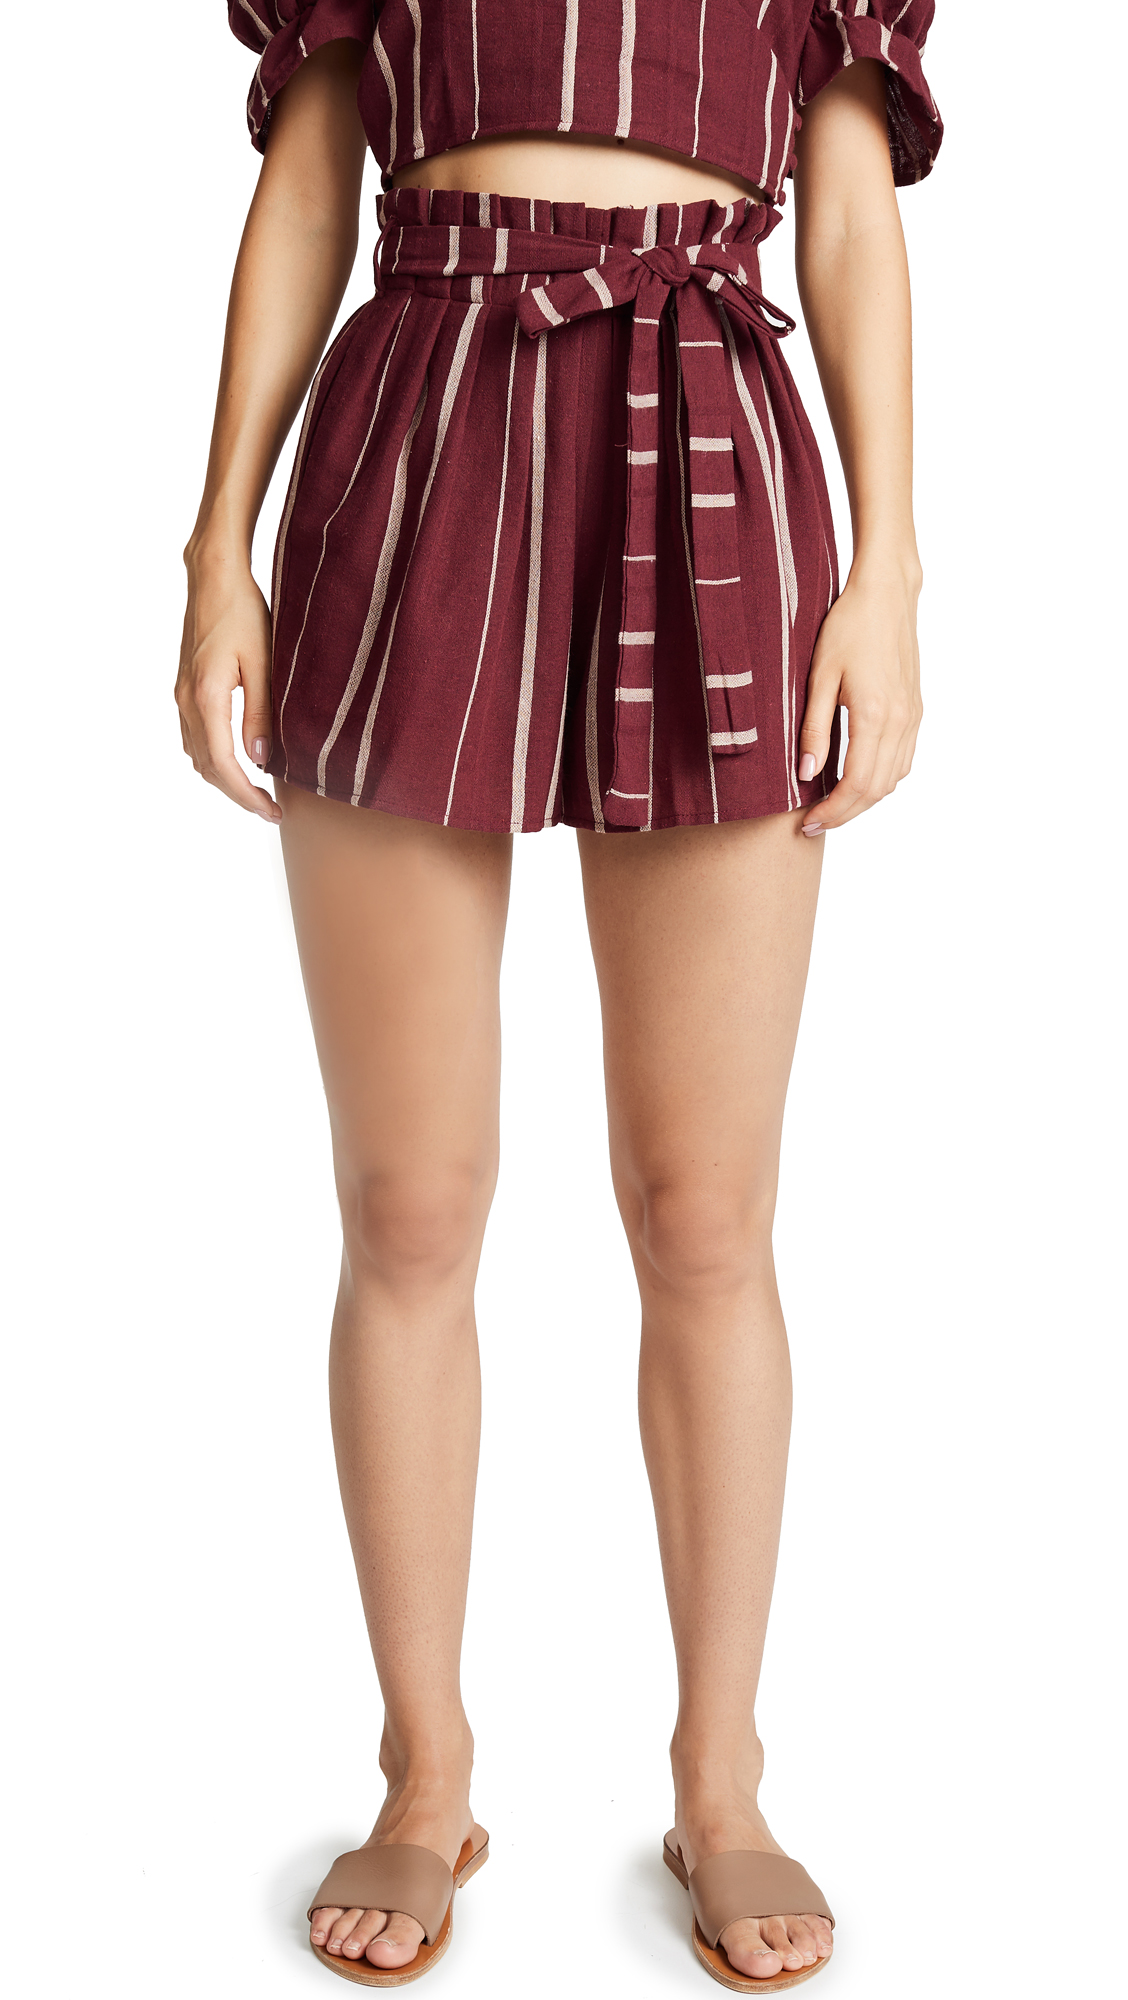 Moon River Paperbag Waist Shorts - Wine/Tan Stripe